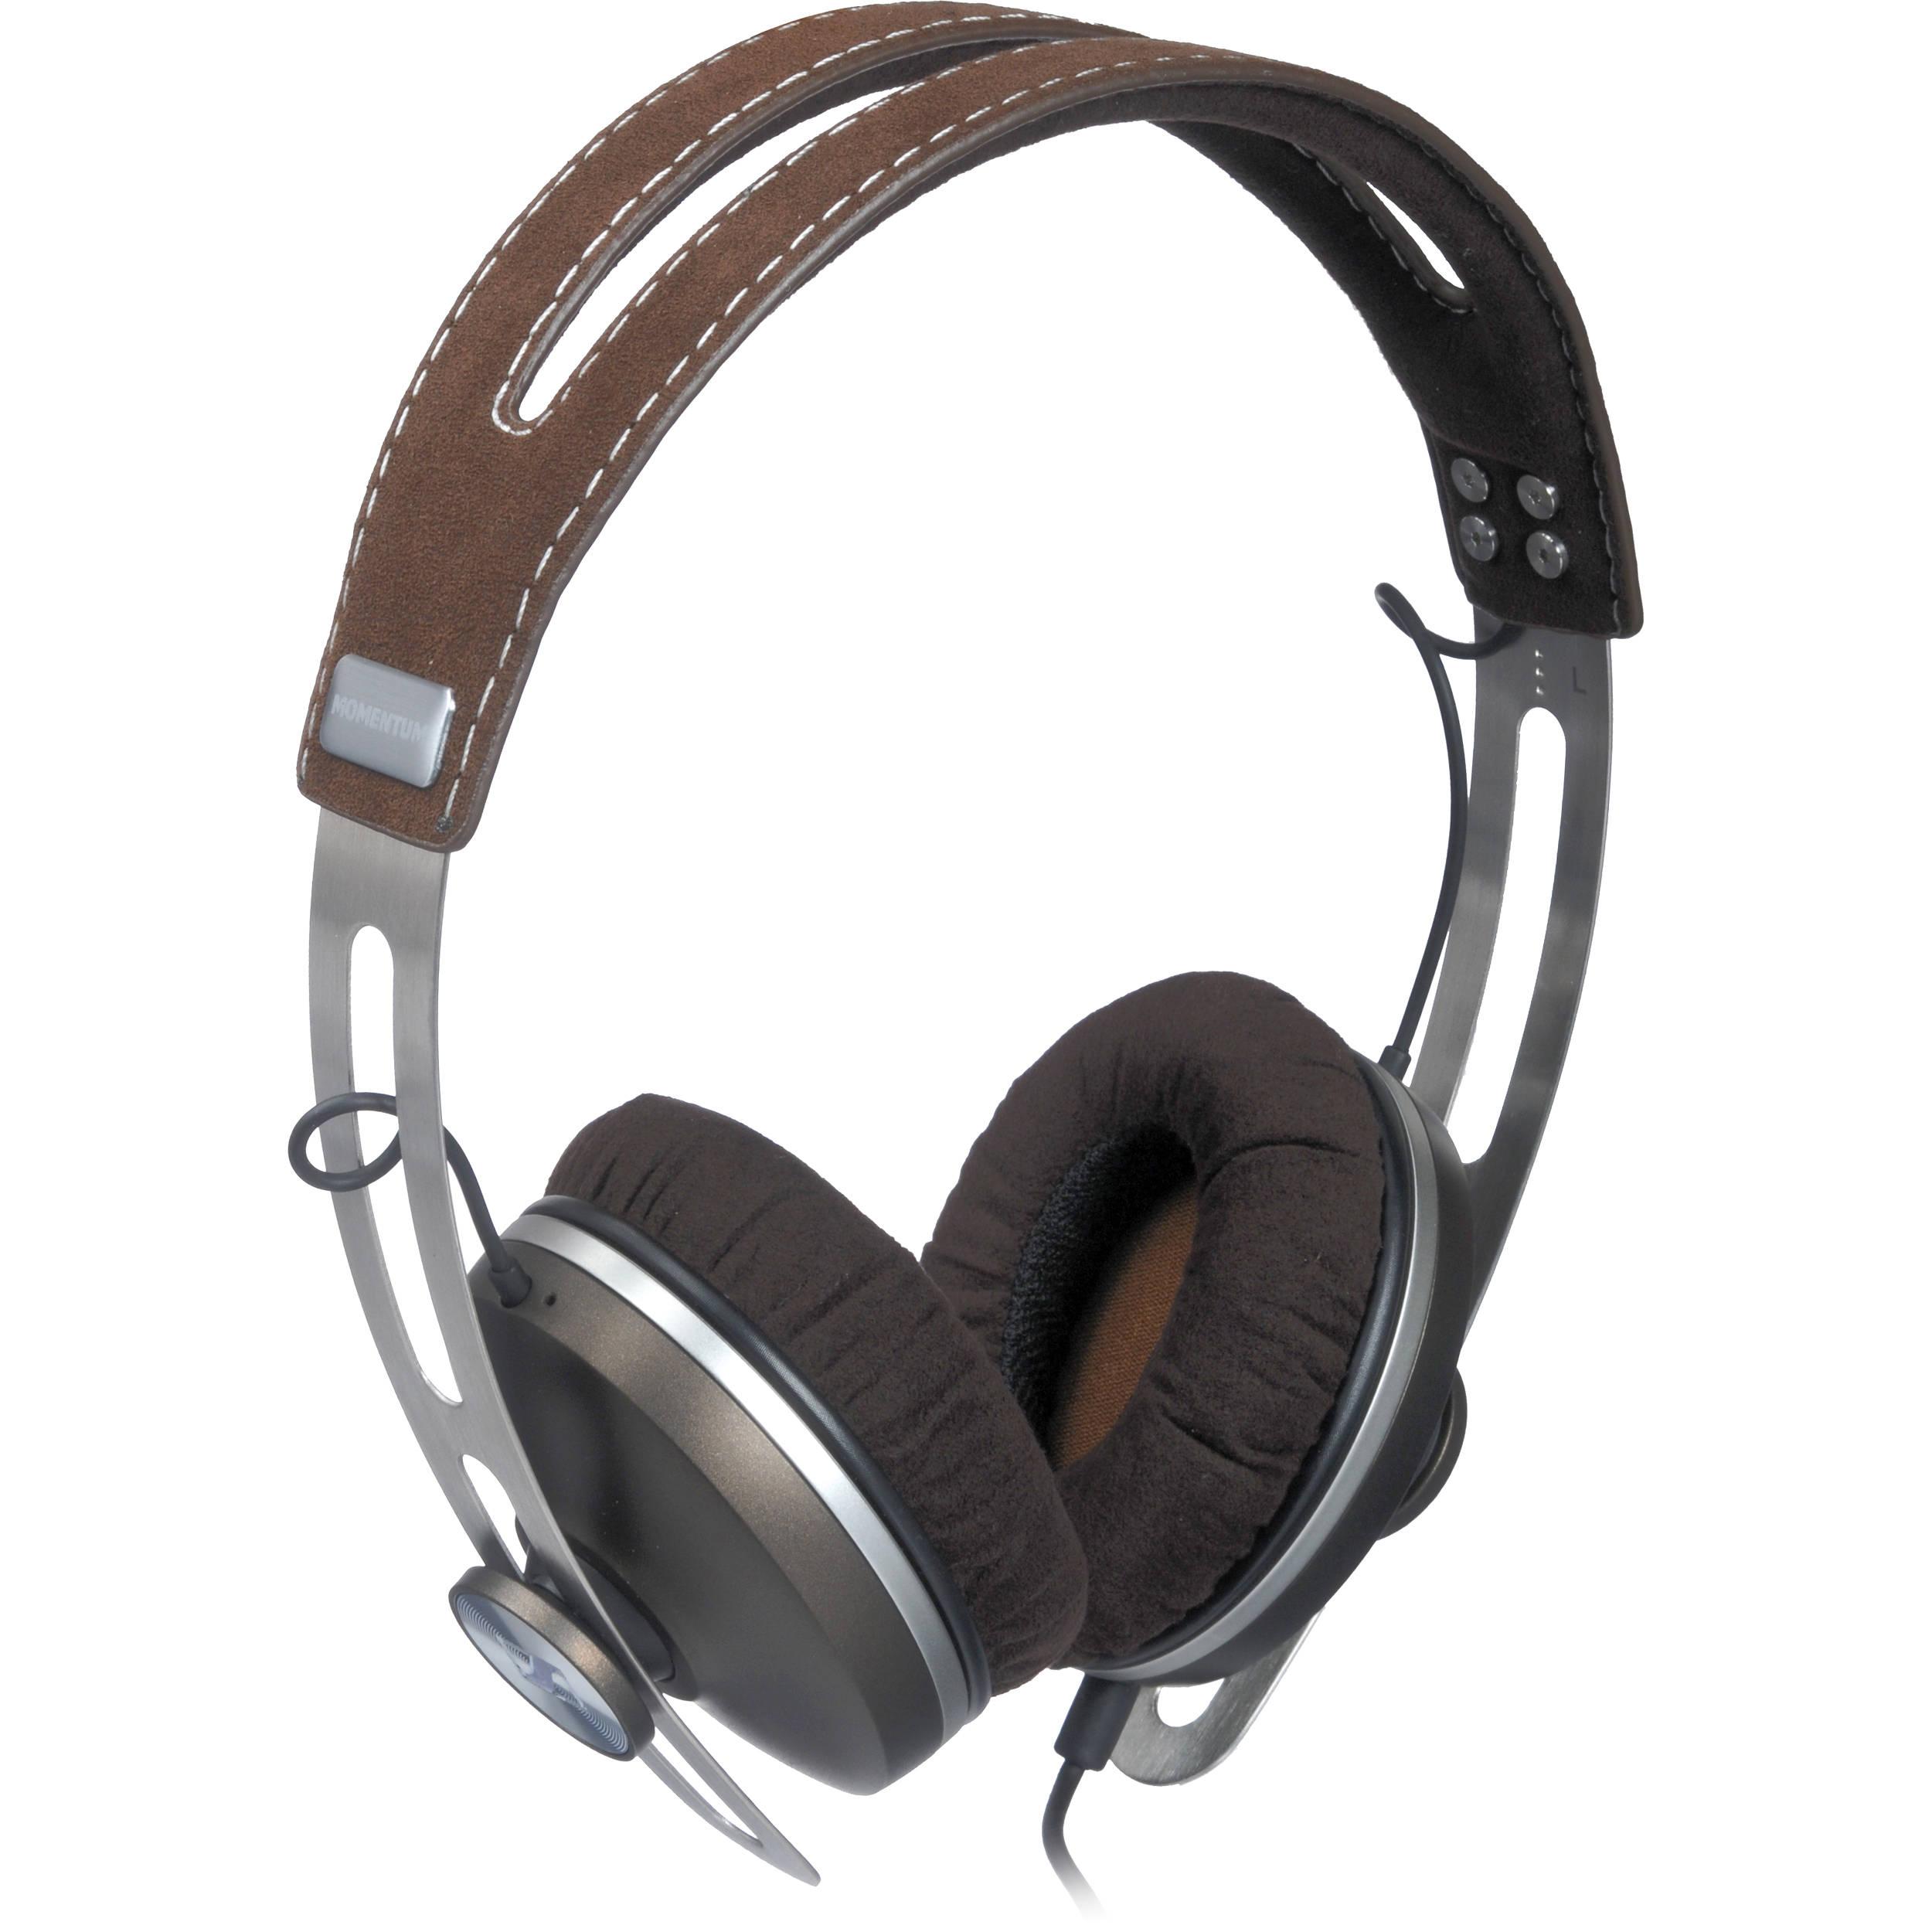 Sennheiser Momentum On-Ear Headphones (Brown) 505796 B H Photo 26e0ef6543